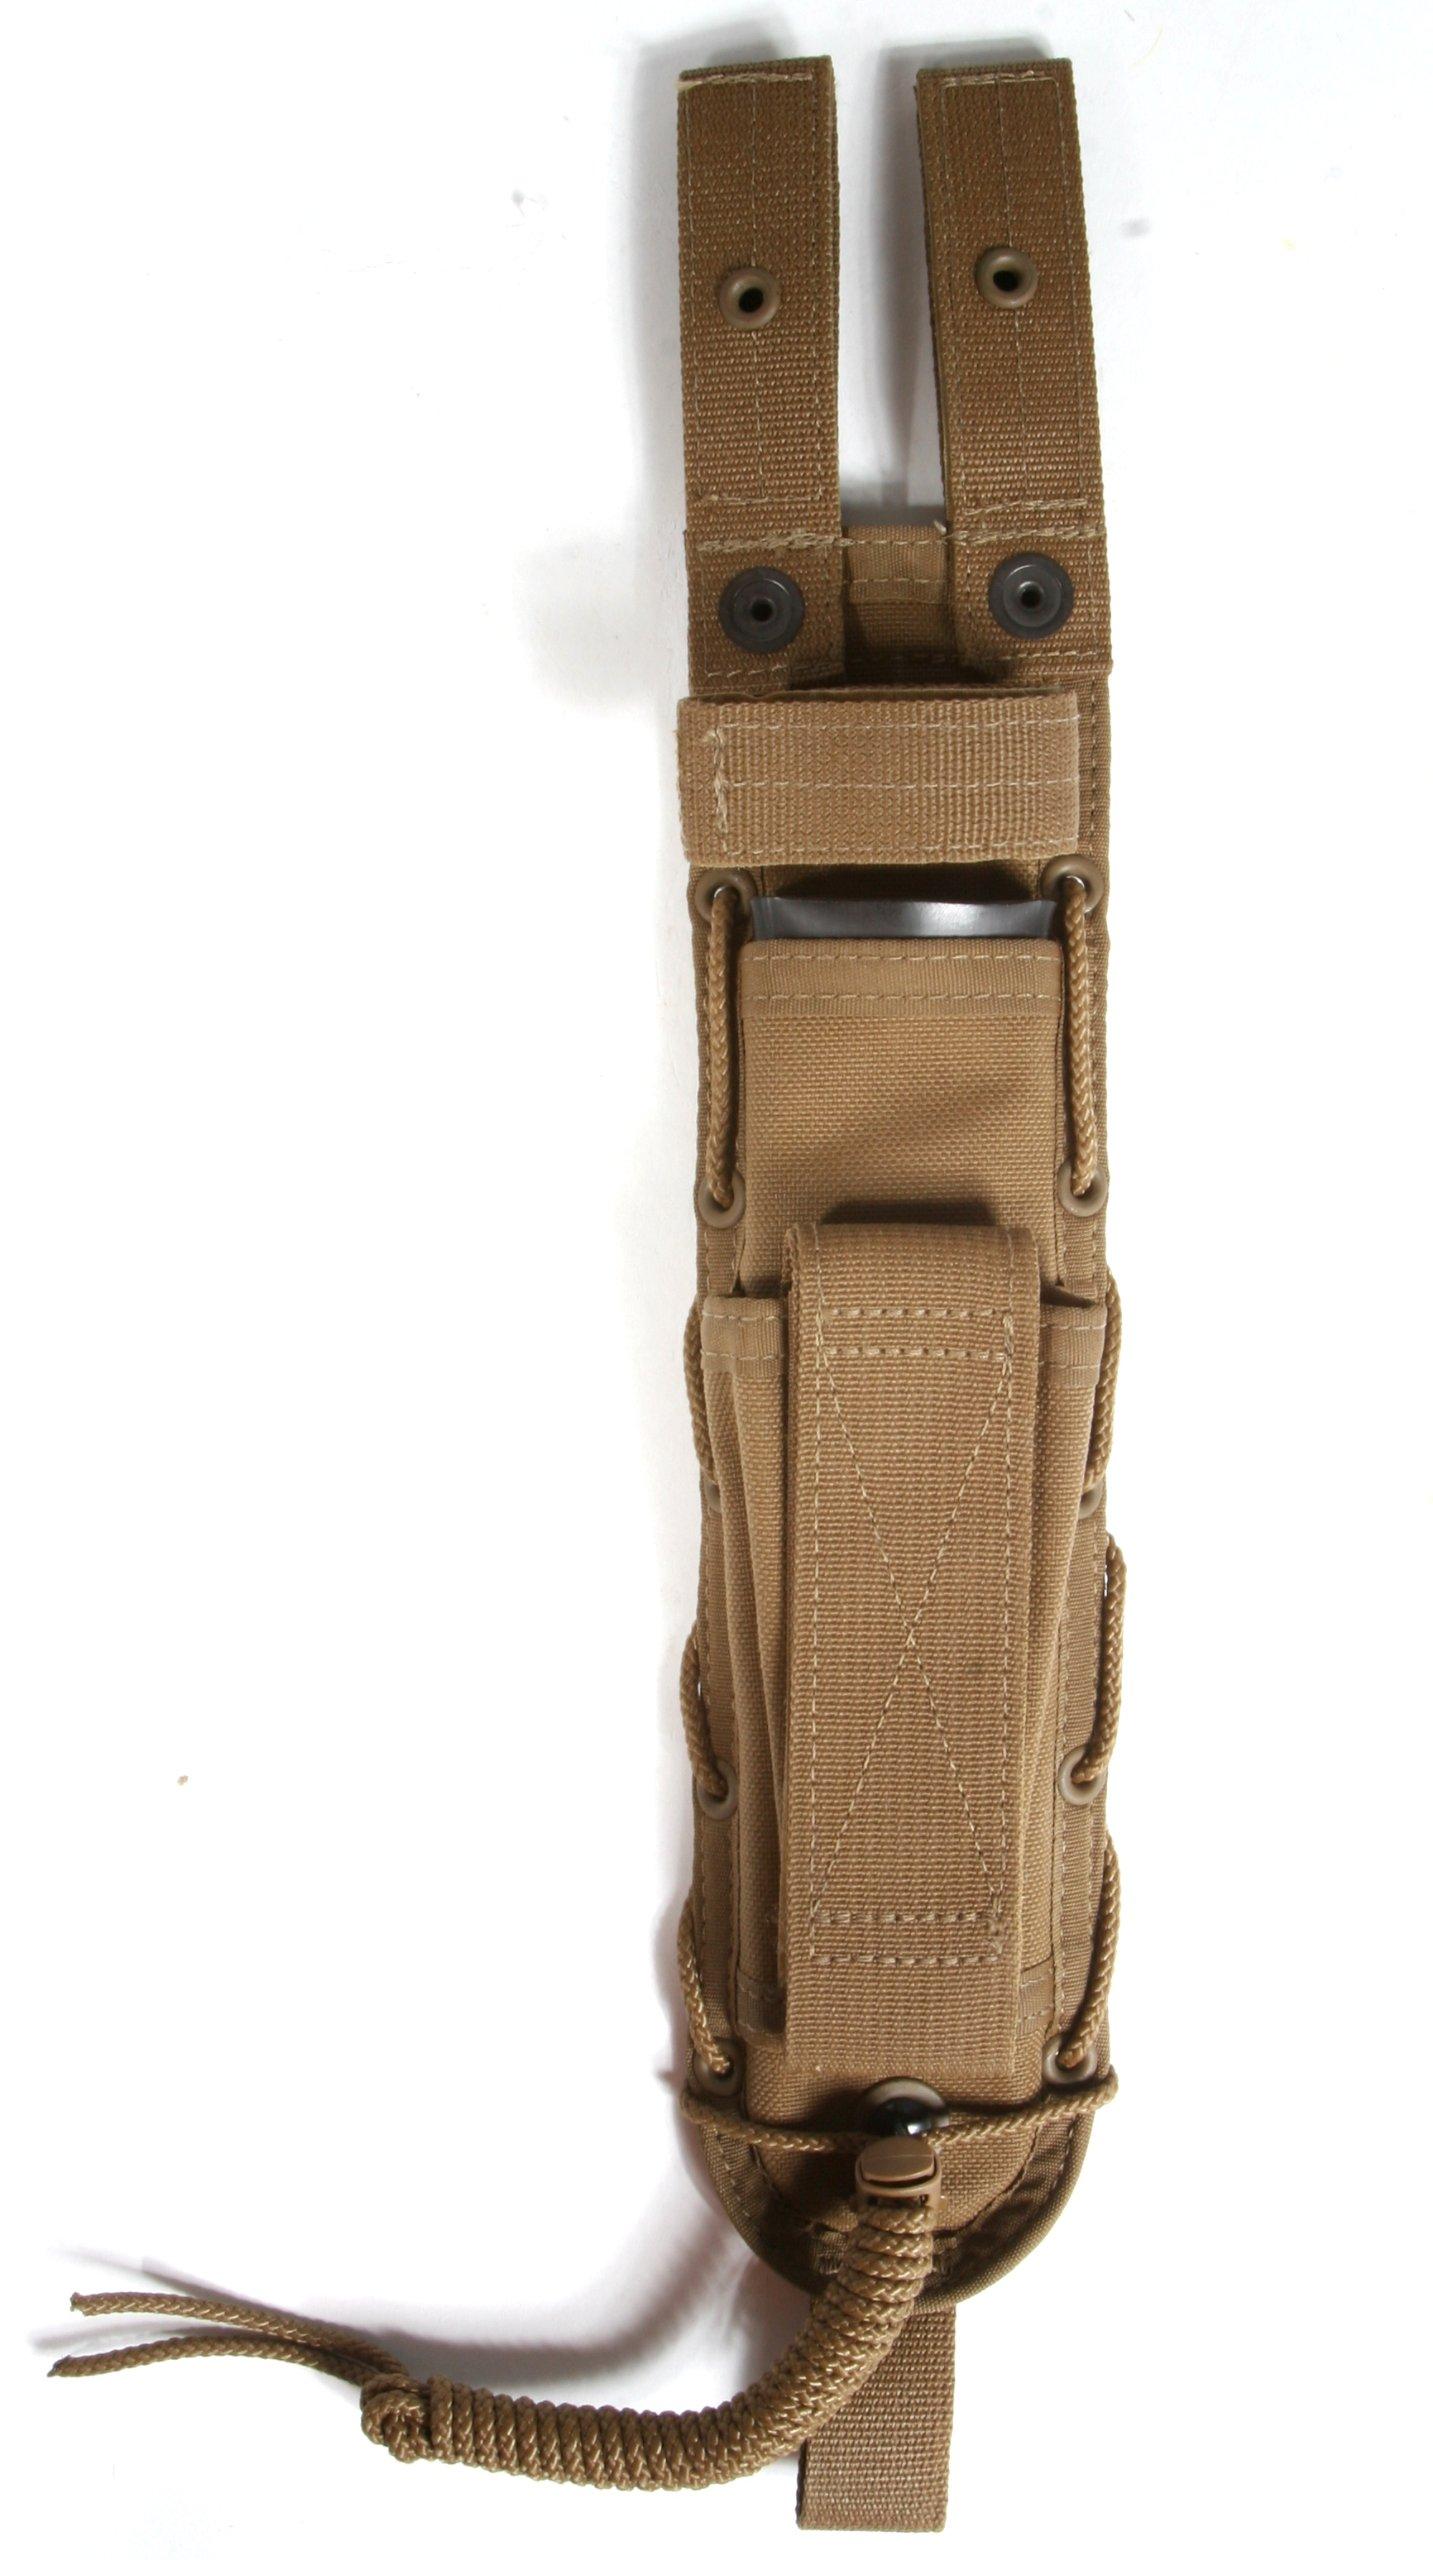 Spec.-Ops. Brand Combat Master Coyote Brown, Long